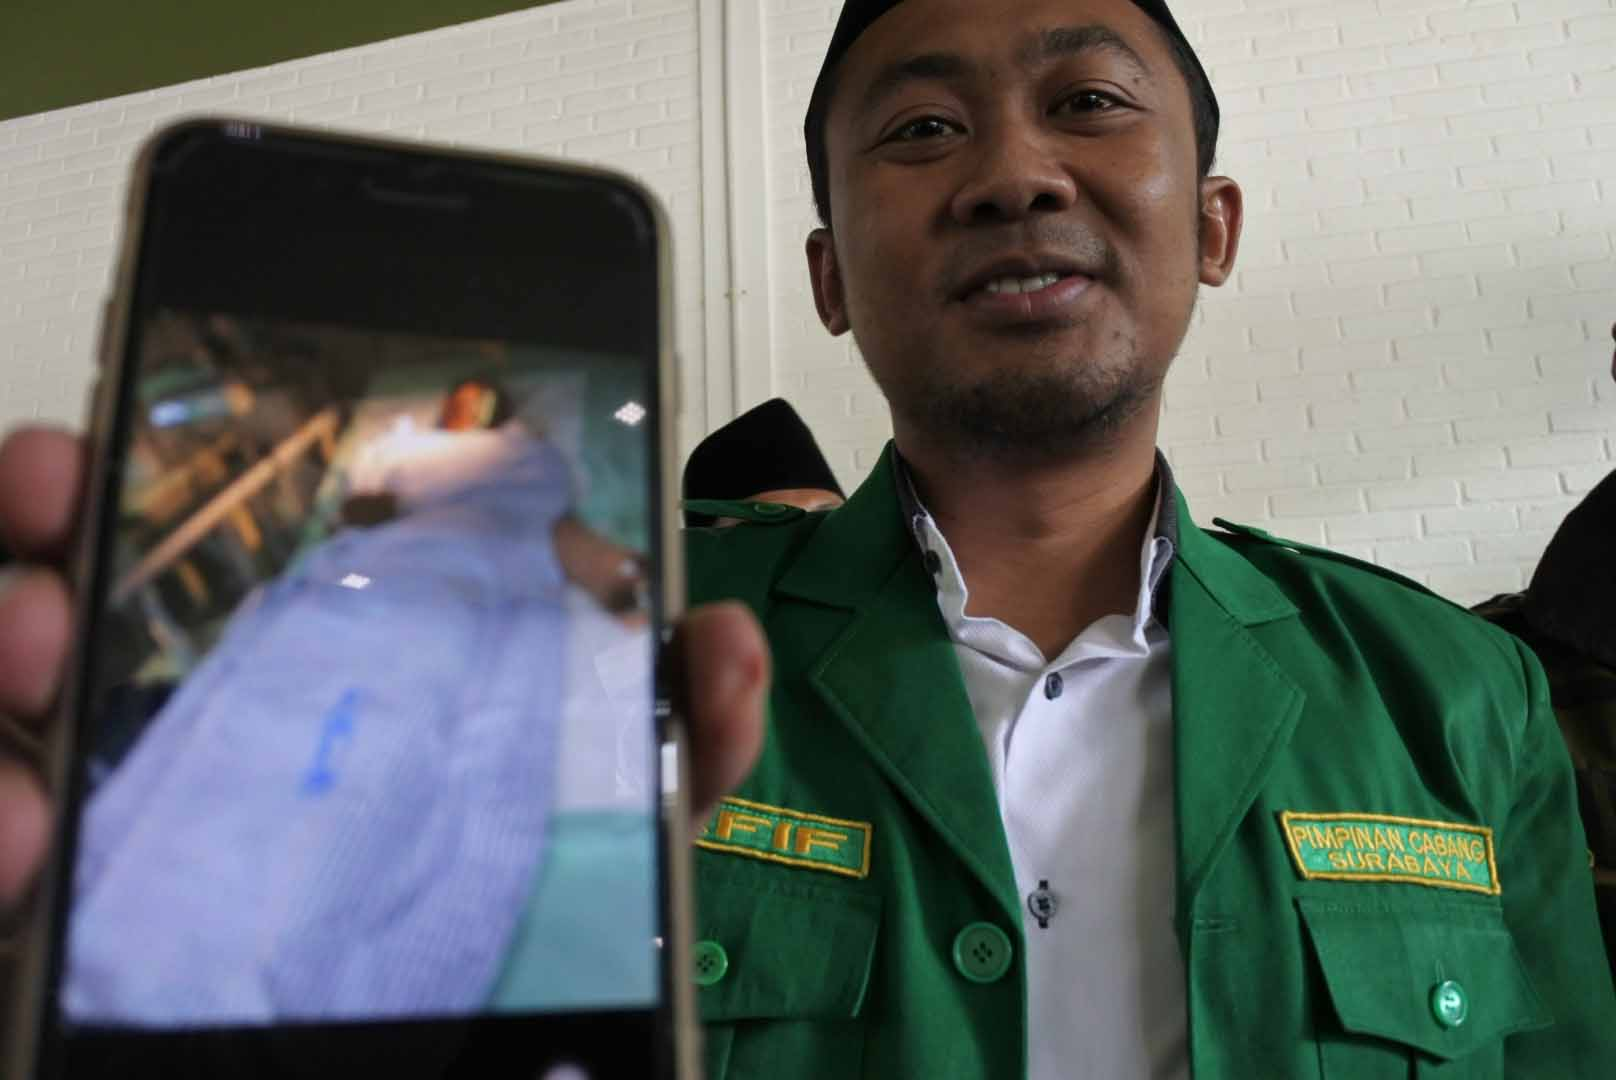 GP Ansor Surabaya Minta Polisi Ungkap Dalang Pembacokan